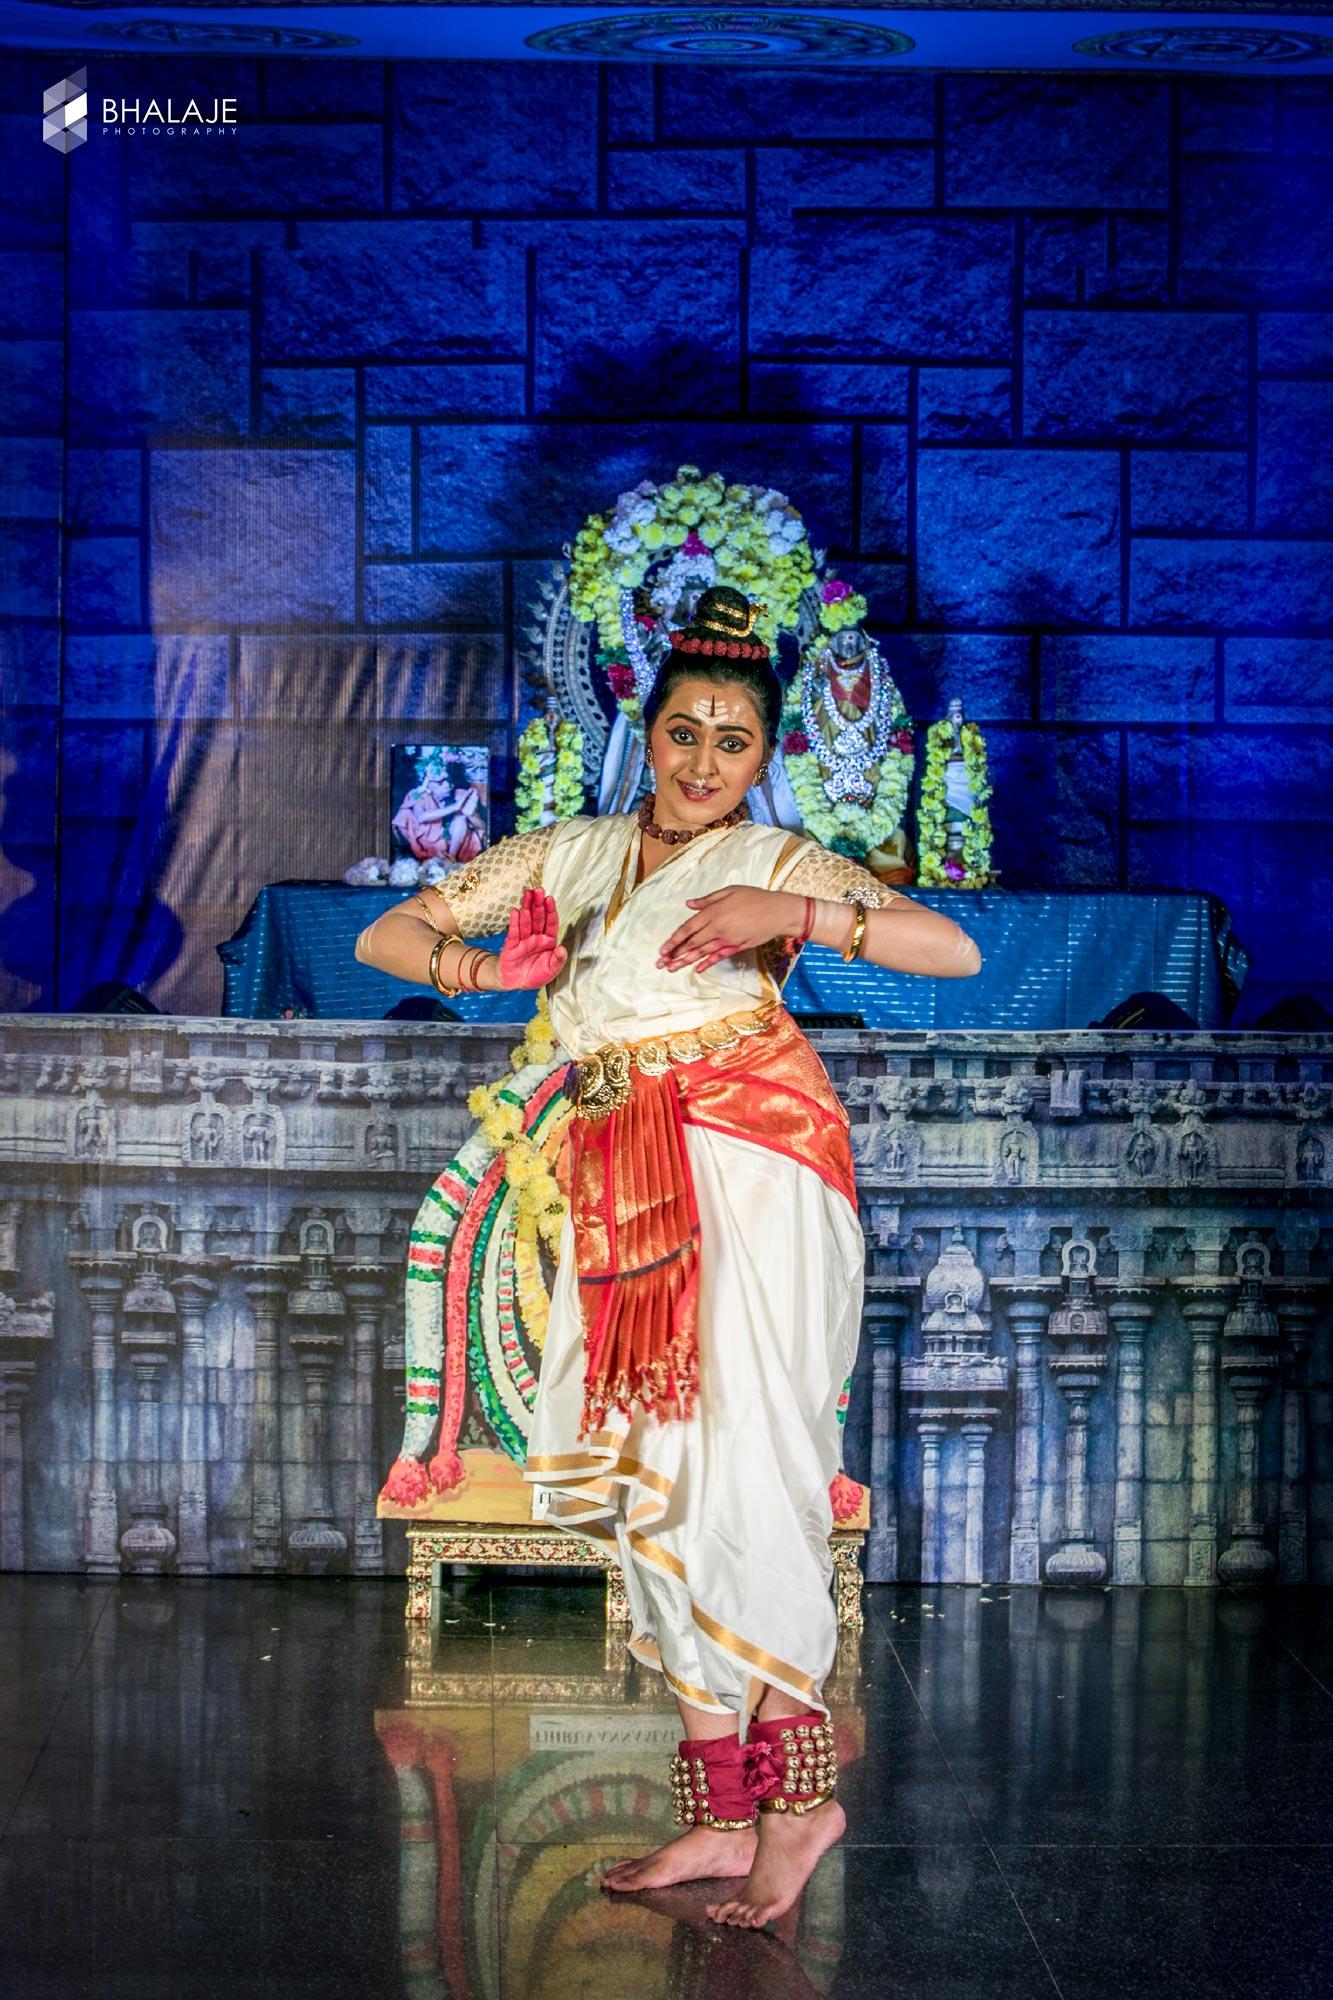 Bharatanatyam Arangetram Photography, Bharatanatyam Poses for Photoshoot, Action Dance Photography, Bharatanatyam Dance Photos,Action dance photography